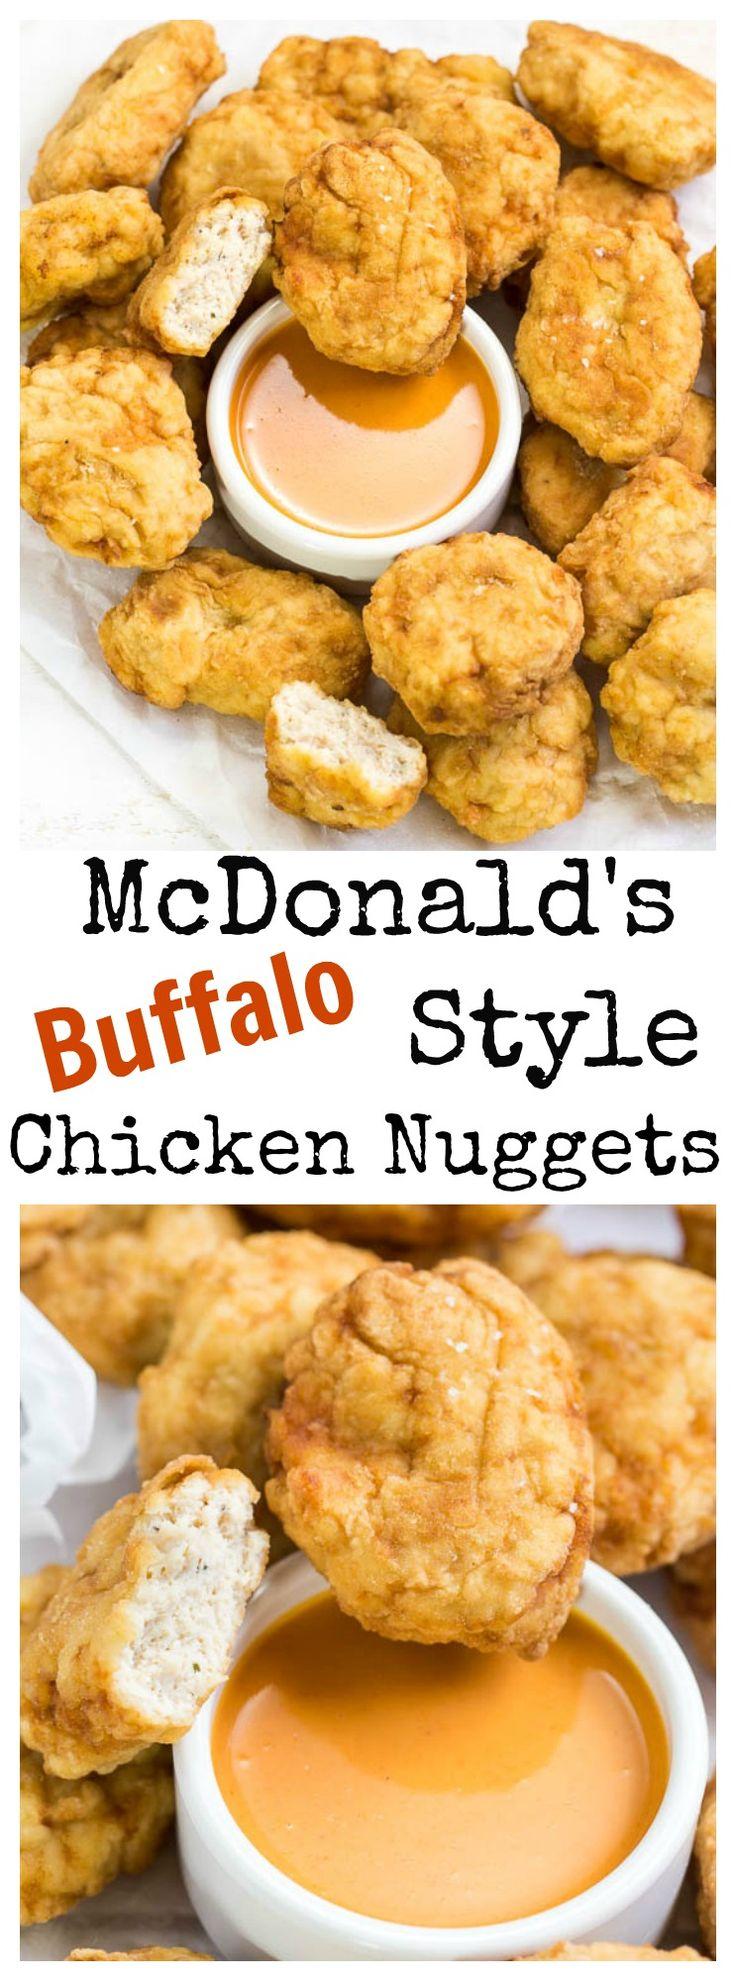 McDonald's Buffalo Style Chicken Nuggets